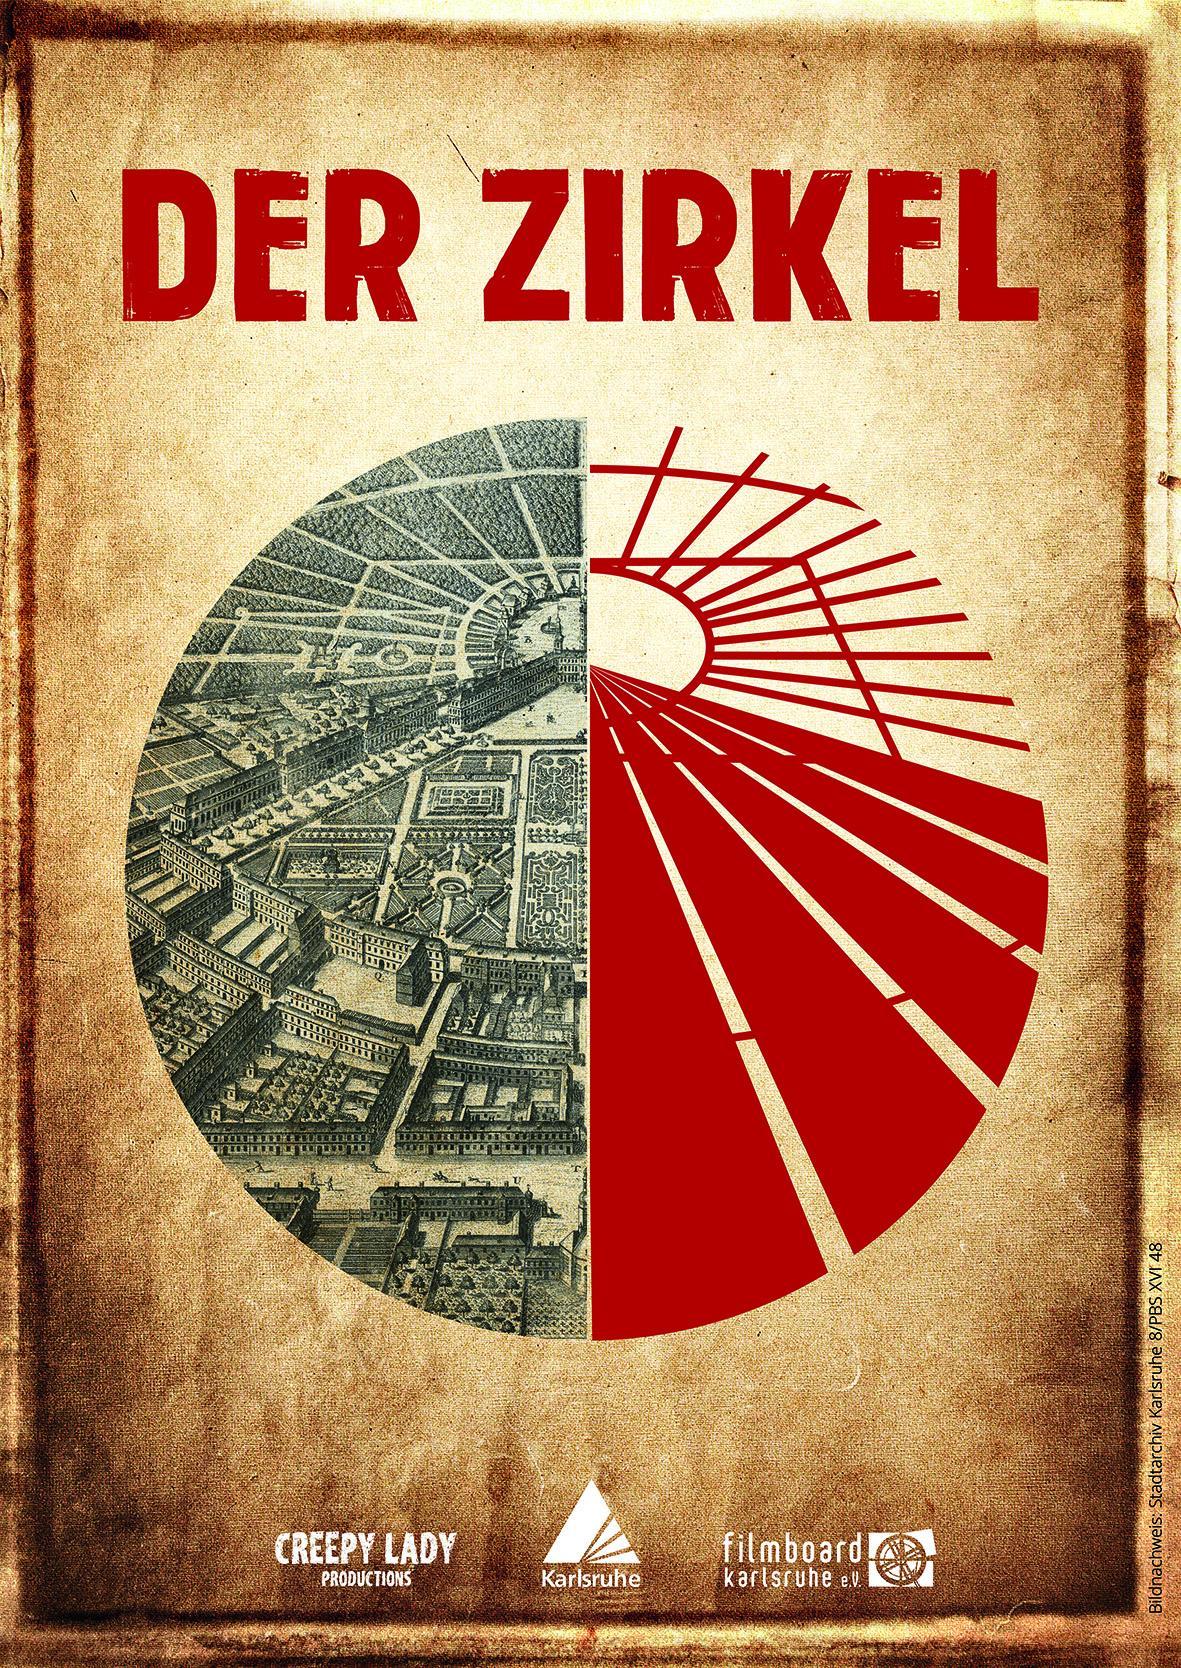 Der Zirkel Poster